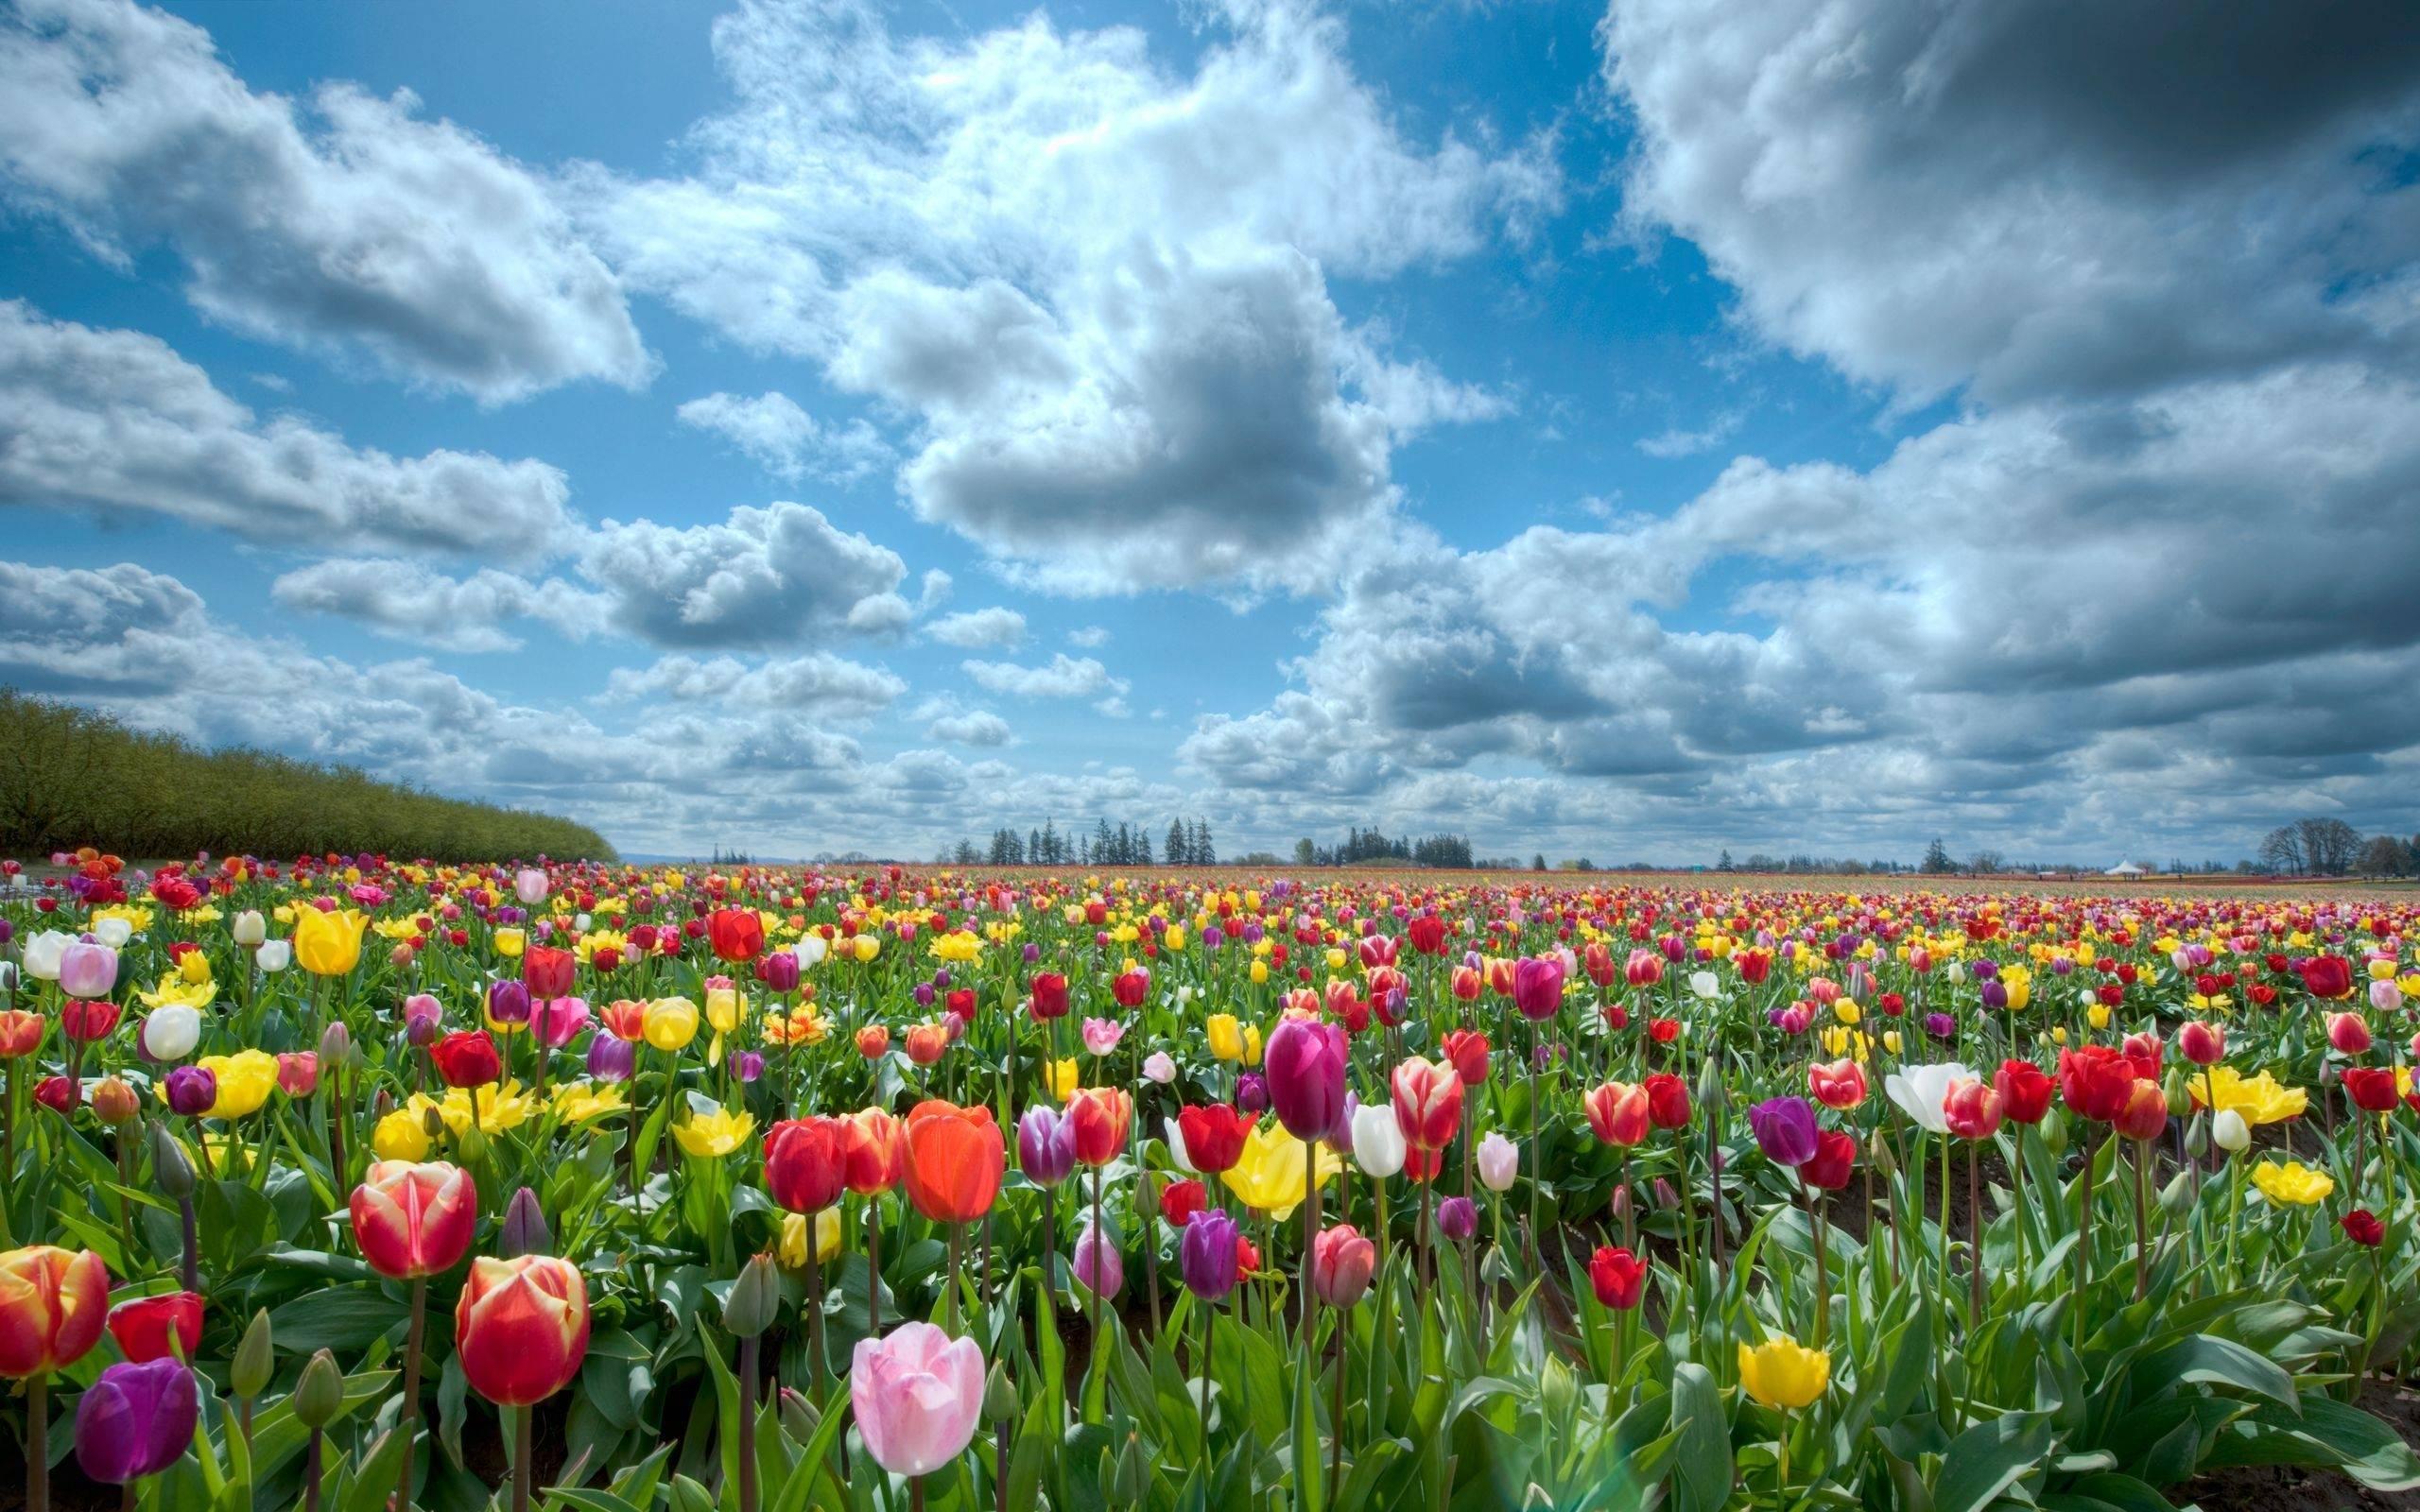 Flower garden pictures - Flowers For Flower Garden Wallpaper Background